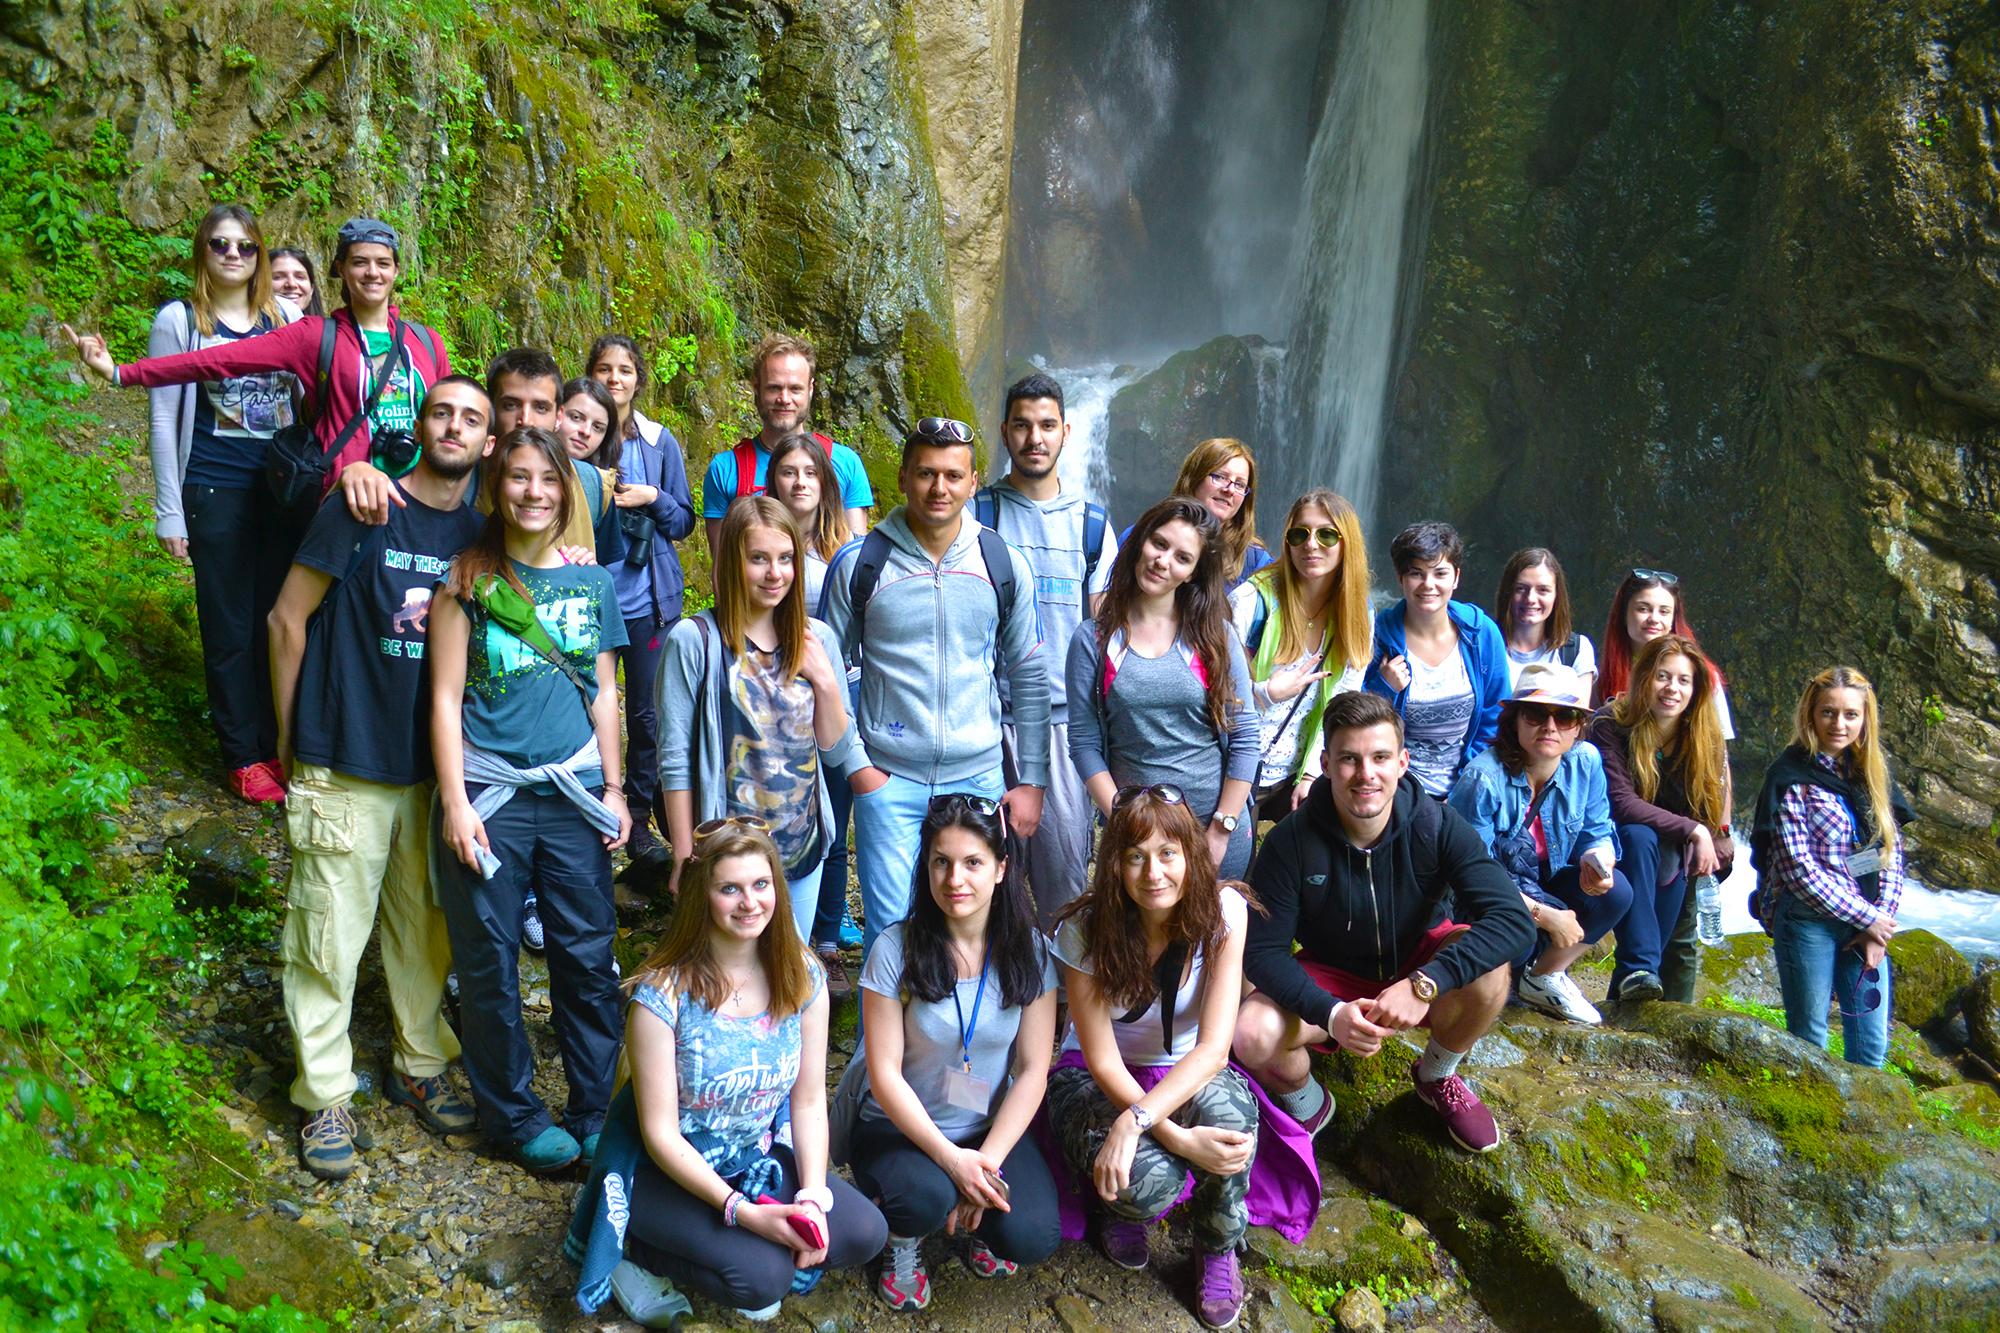 At Duf Water Falls in Mavrovo National Park